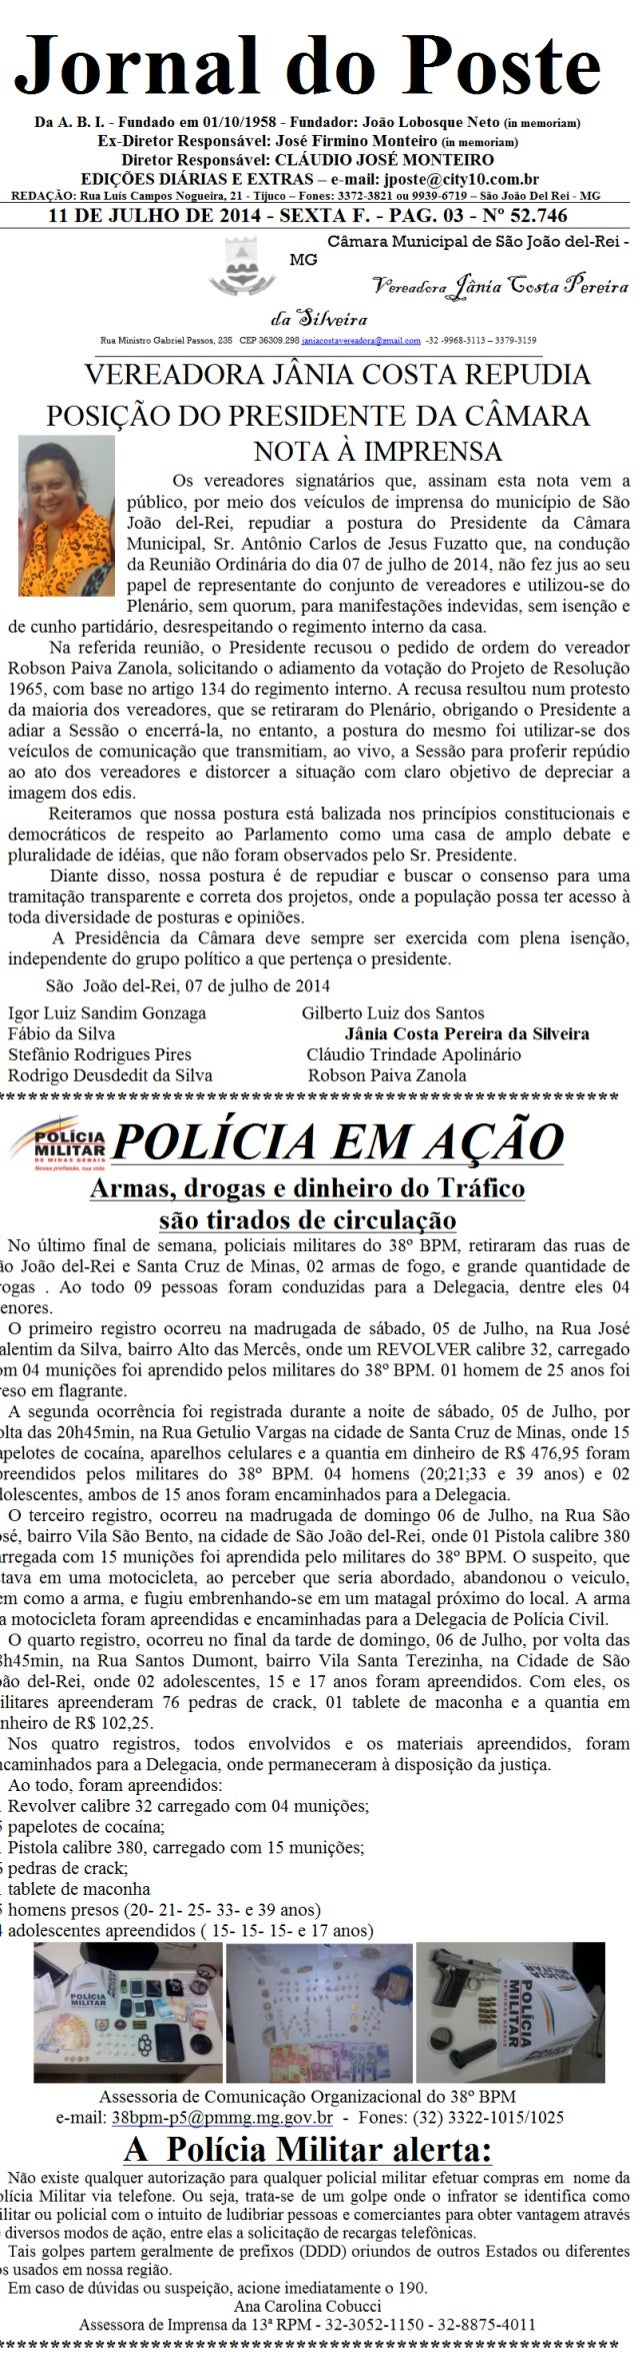 Jornal do poste 55 b 5